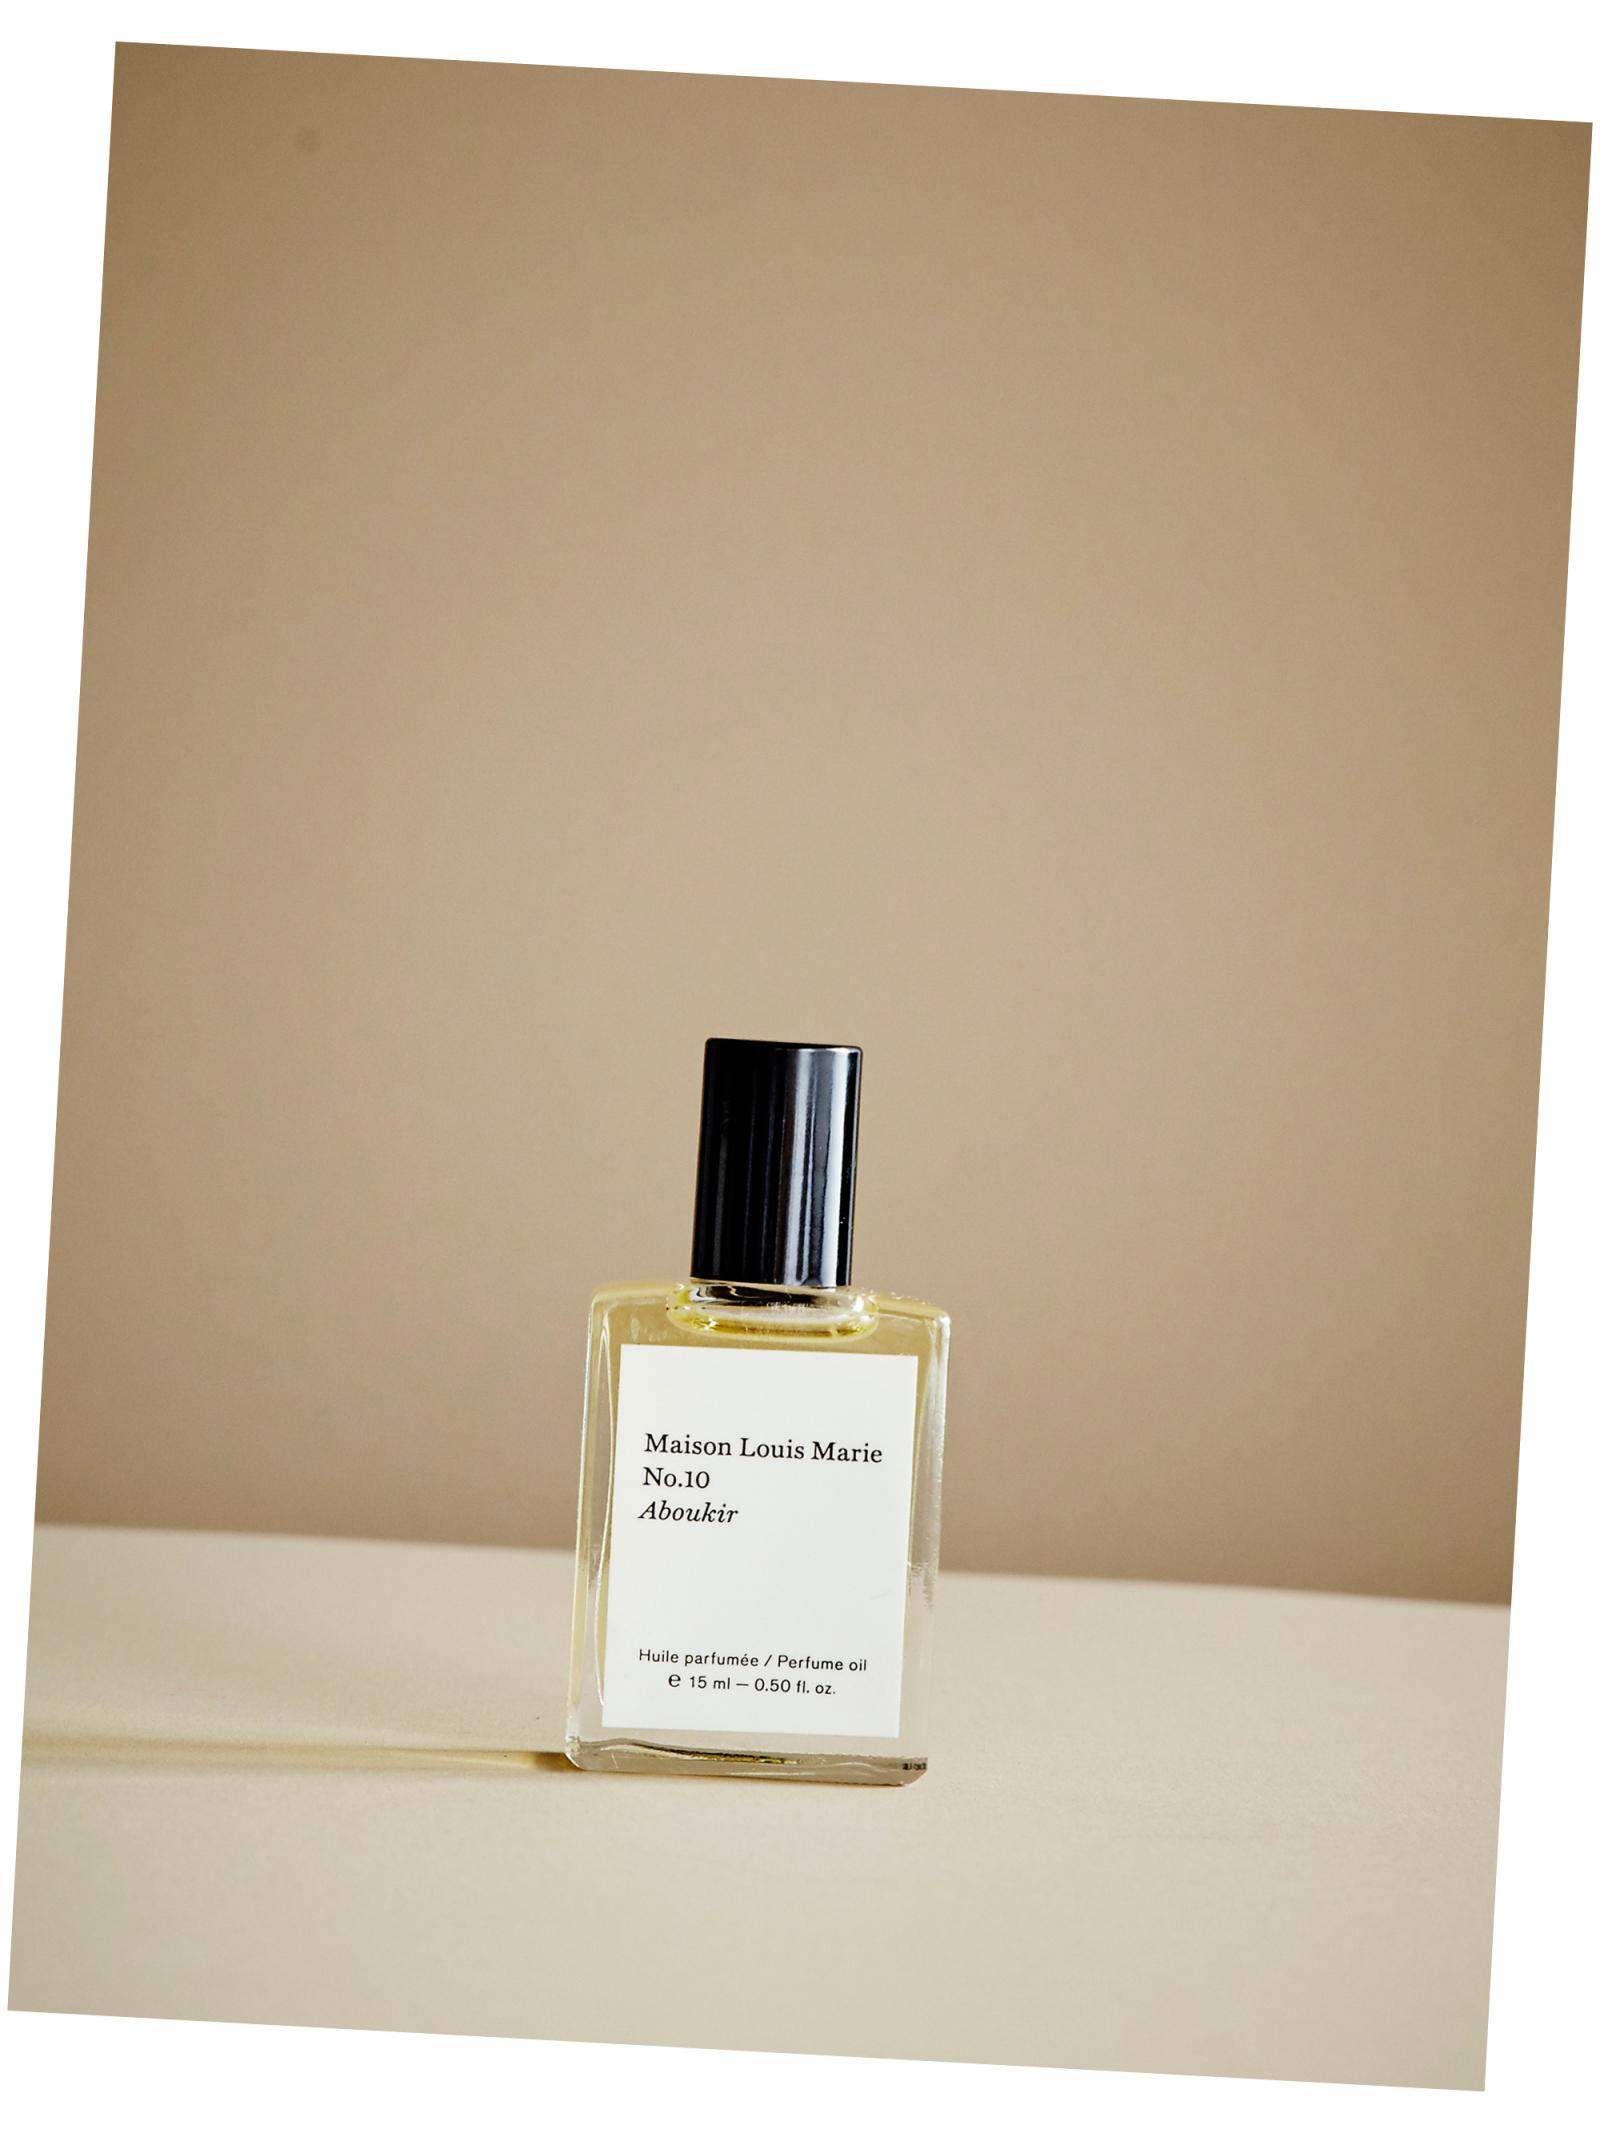 Perfume Oil Aboukir - Maison Louis Marie